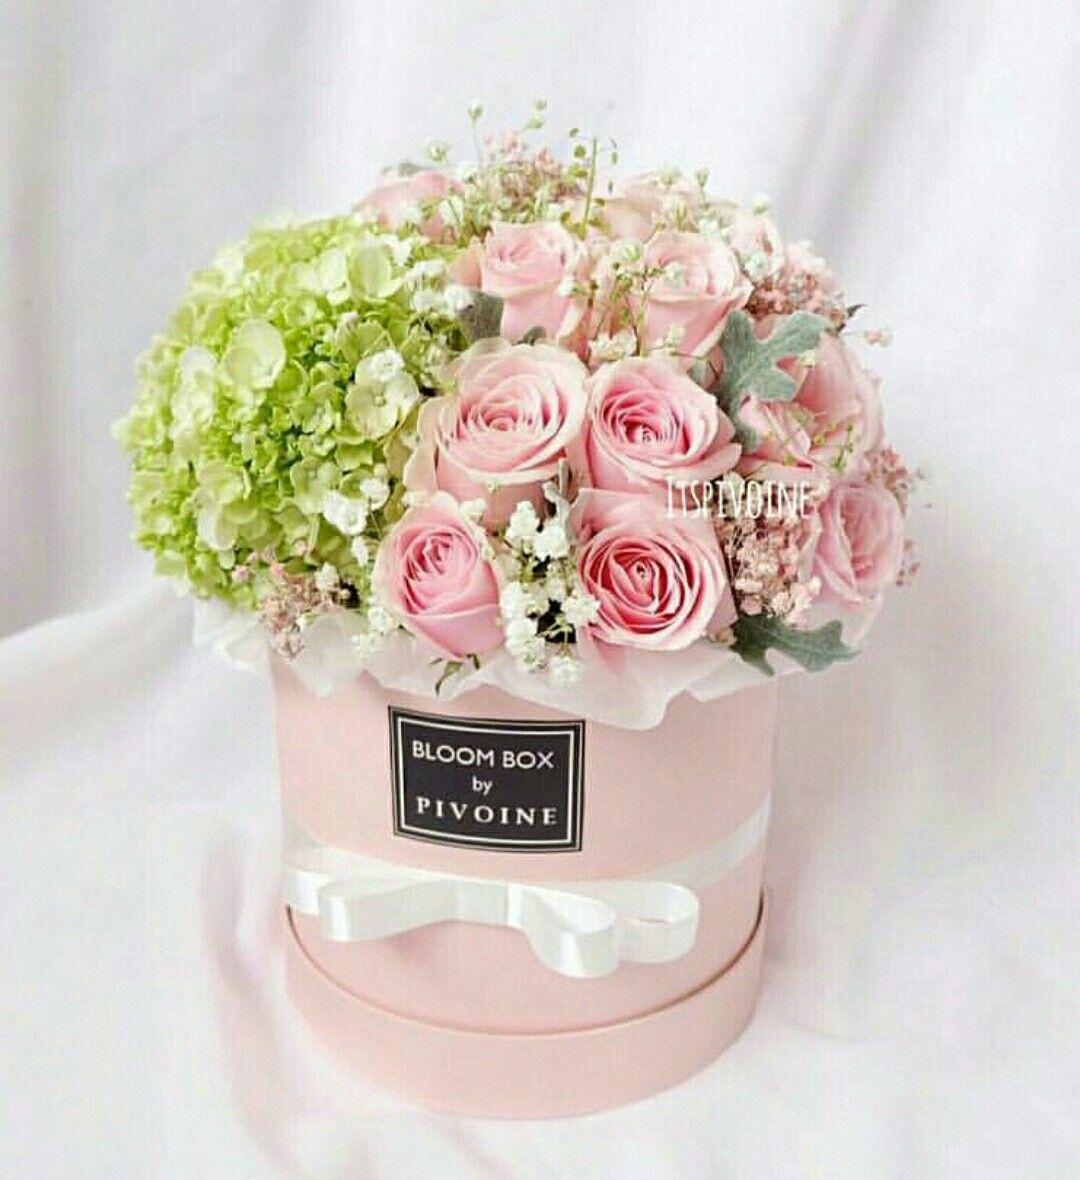 Pin by Liza Dinata on FLOWER BOX 4 | Pinterest | Flower, Flower ...